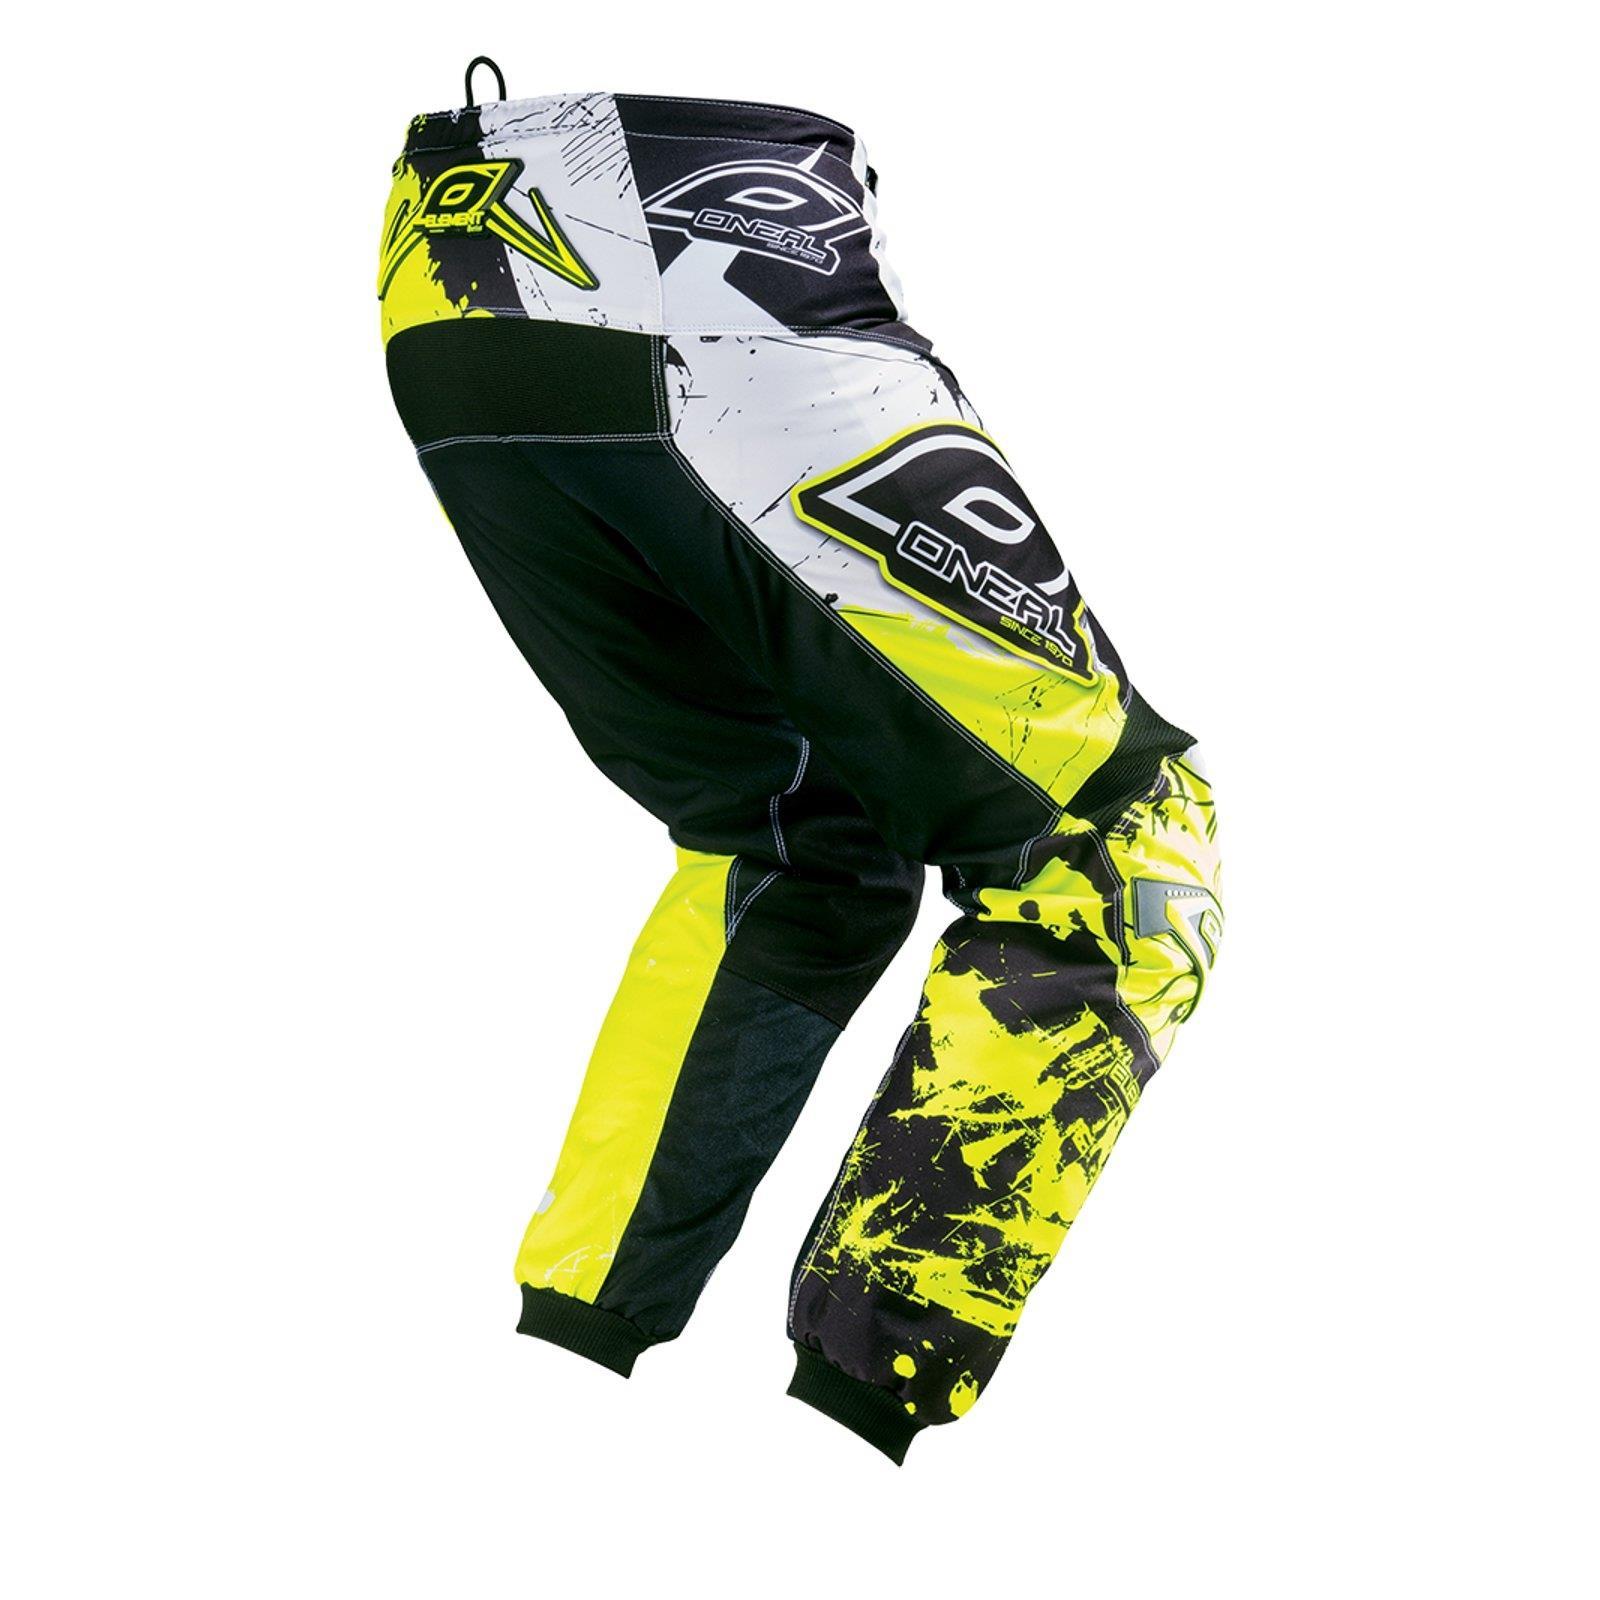 ONeal-pantalones-de-Jersey-de-los-ninos-de-pantalones-cortos-ninos-MX-bicicleta-DH-montana-bicicleta miniatura 69